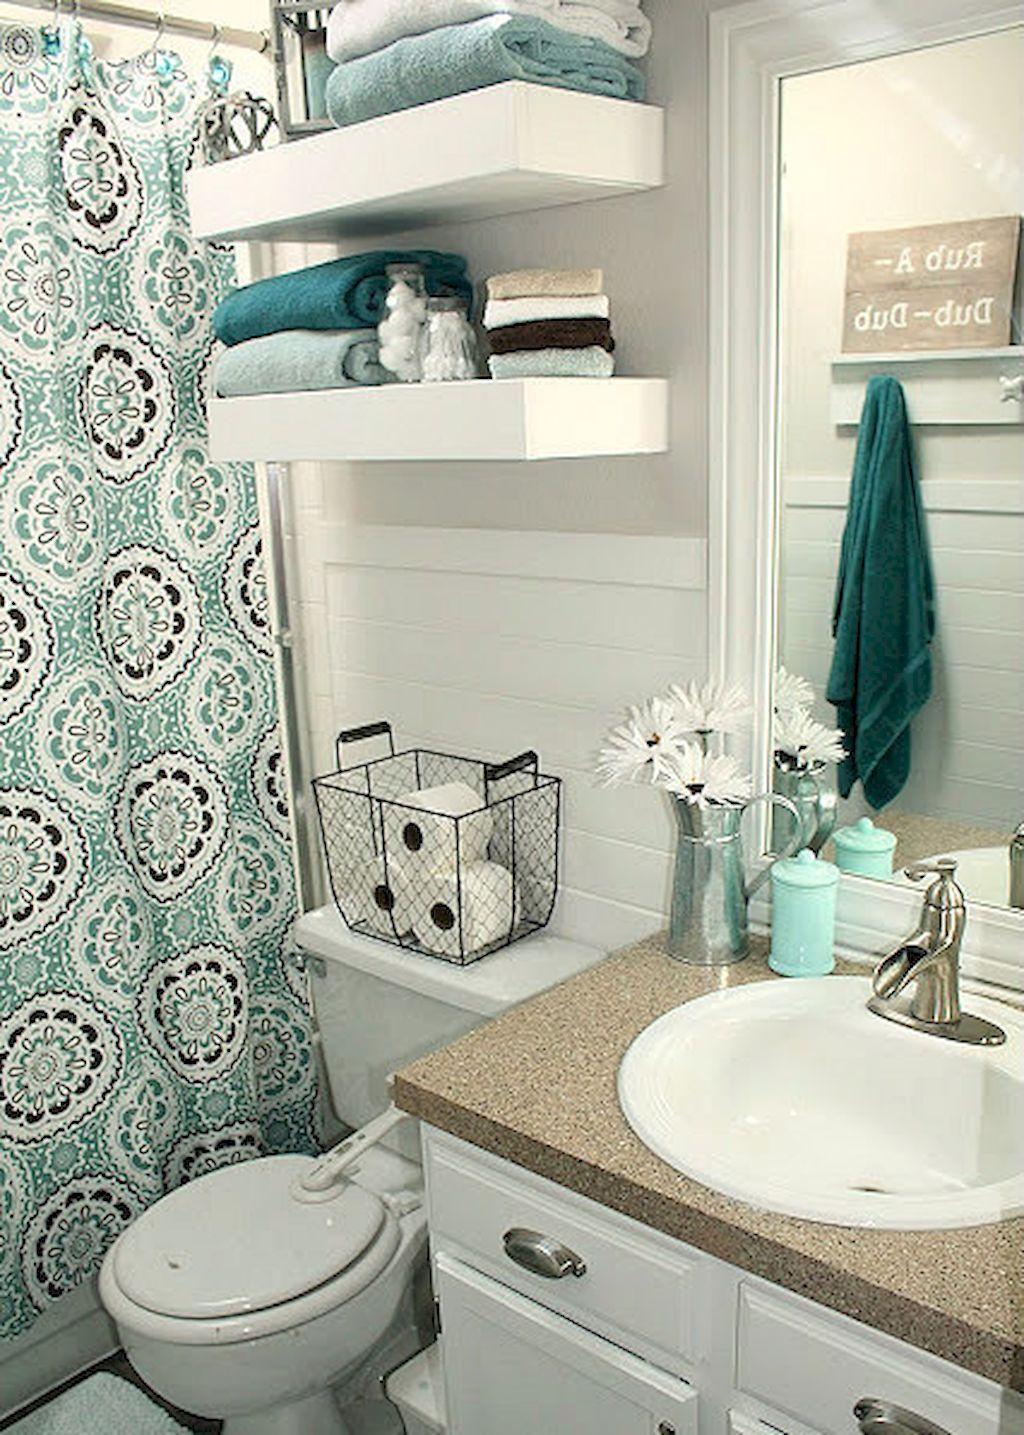 bathroom decorating ideas gorgeous 30 diy small apartment decorating ideas on a budget NWJAGKF